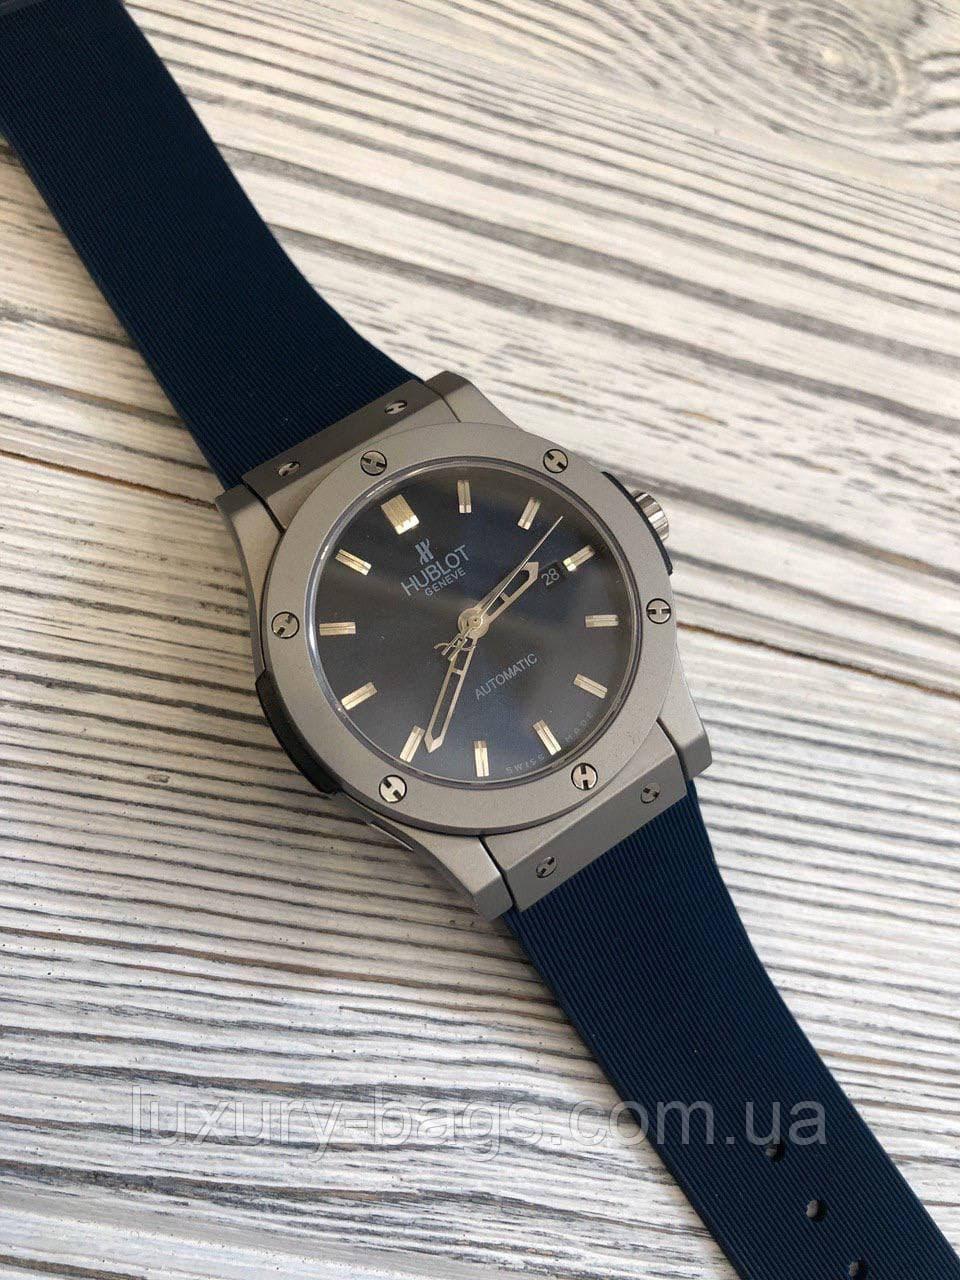 Годинники наручні Hubl0t 5826 Classic Fusion Automatic Blue-Silver-Mate-Blue